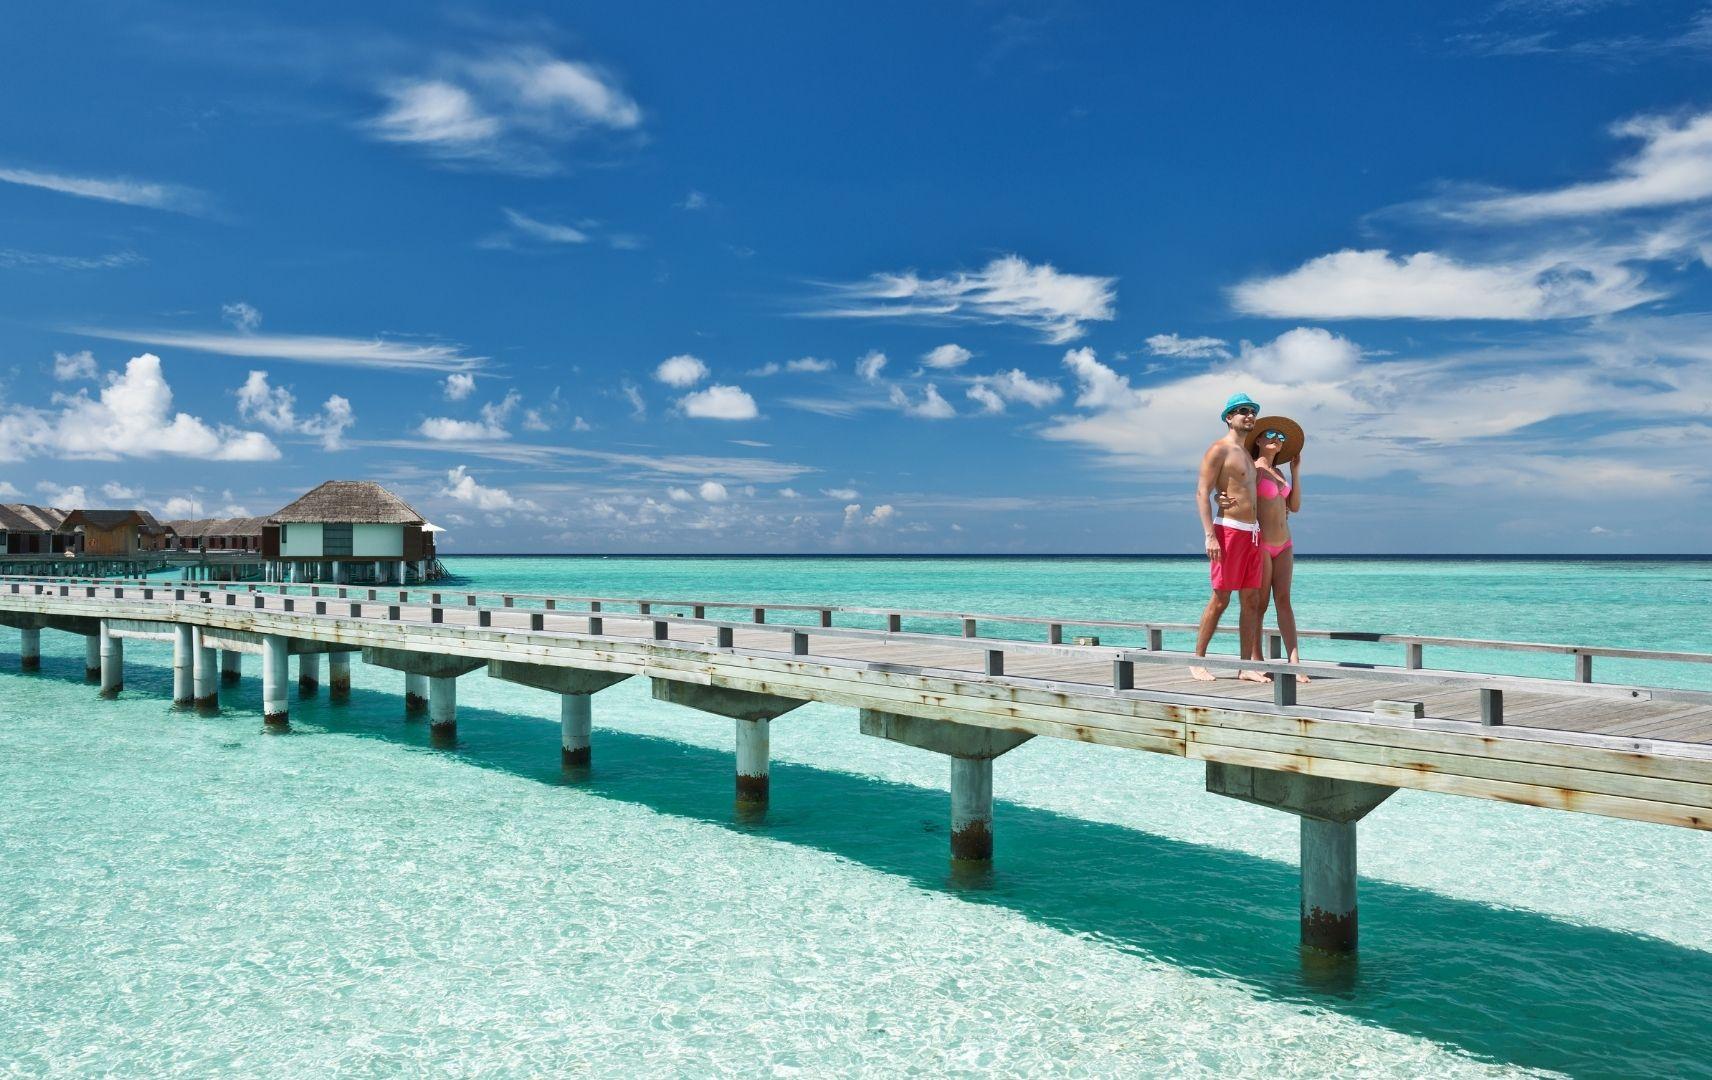 Fernreise - Malediven Paar